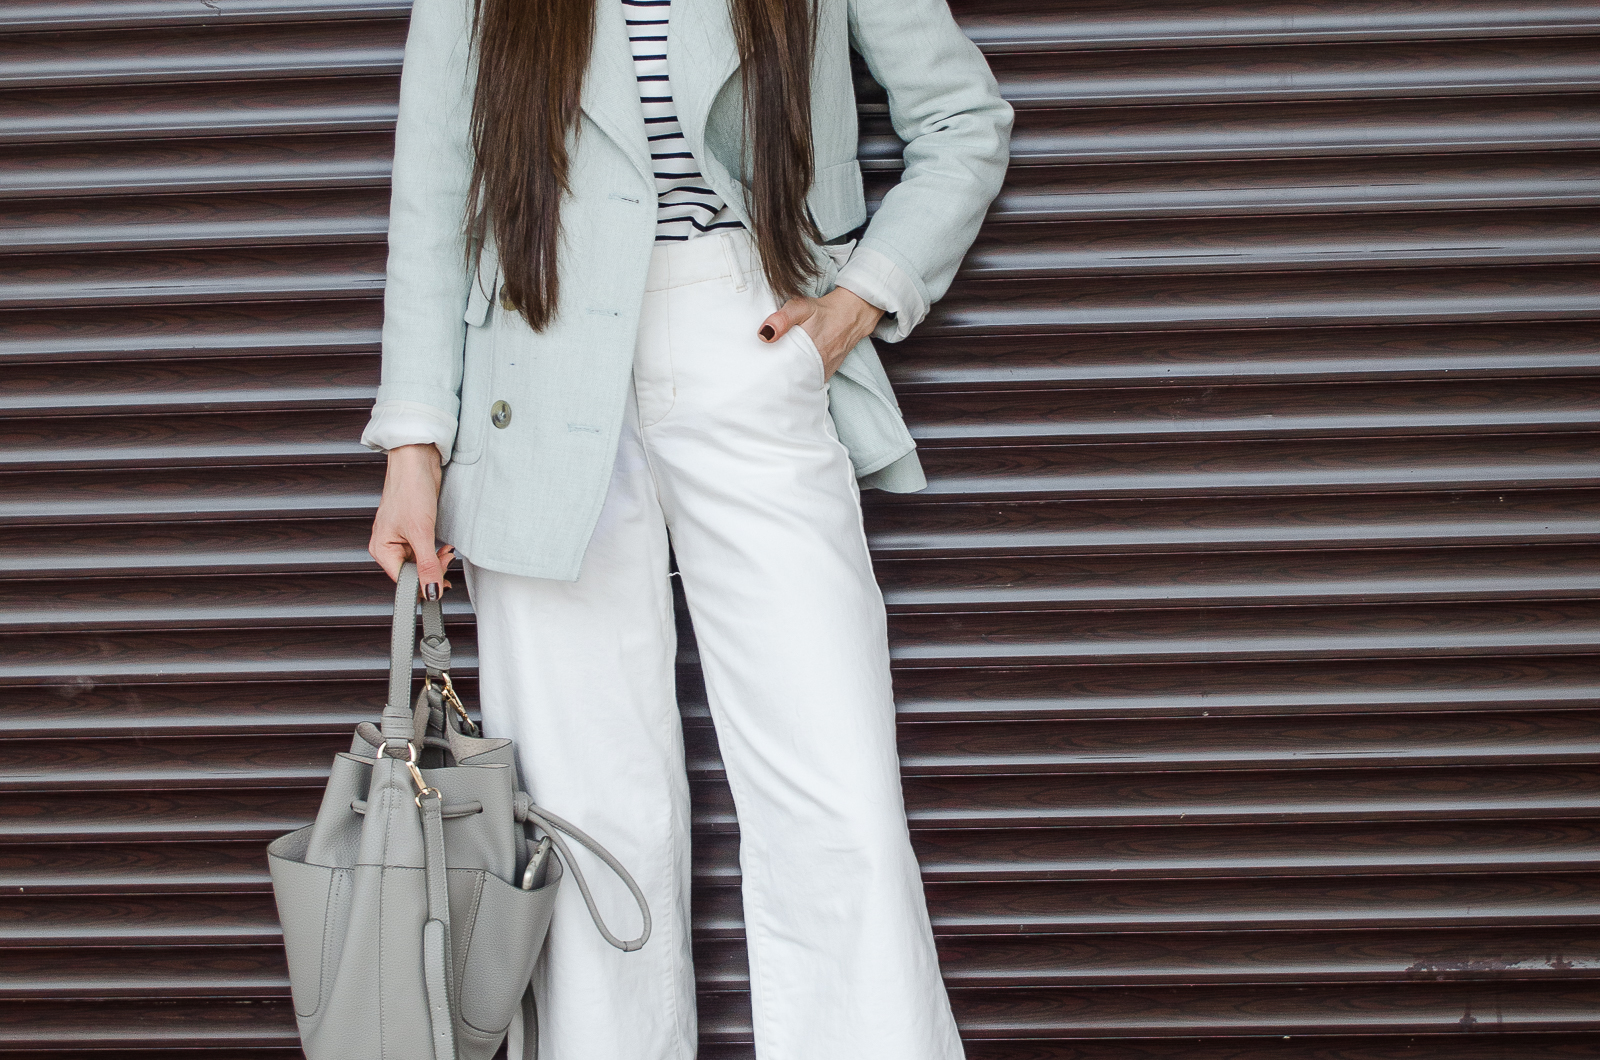 fashion blogger diyorasnotes slipons asos white culottes baseball hat 25 - BASEBALL CAP AND WHITE CULOTTES